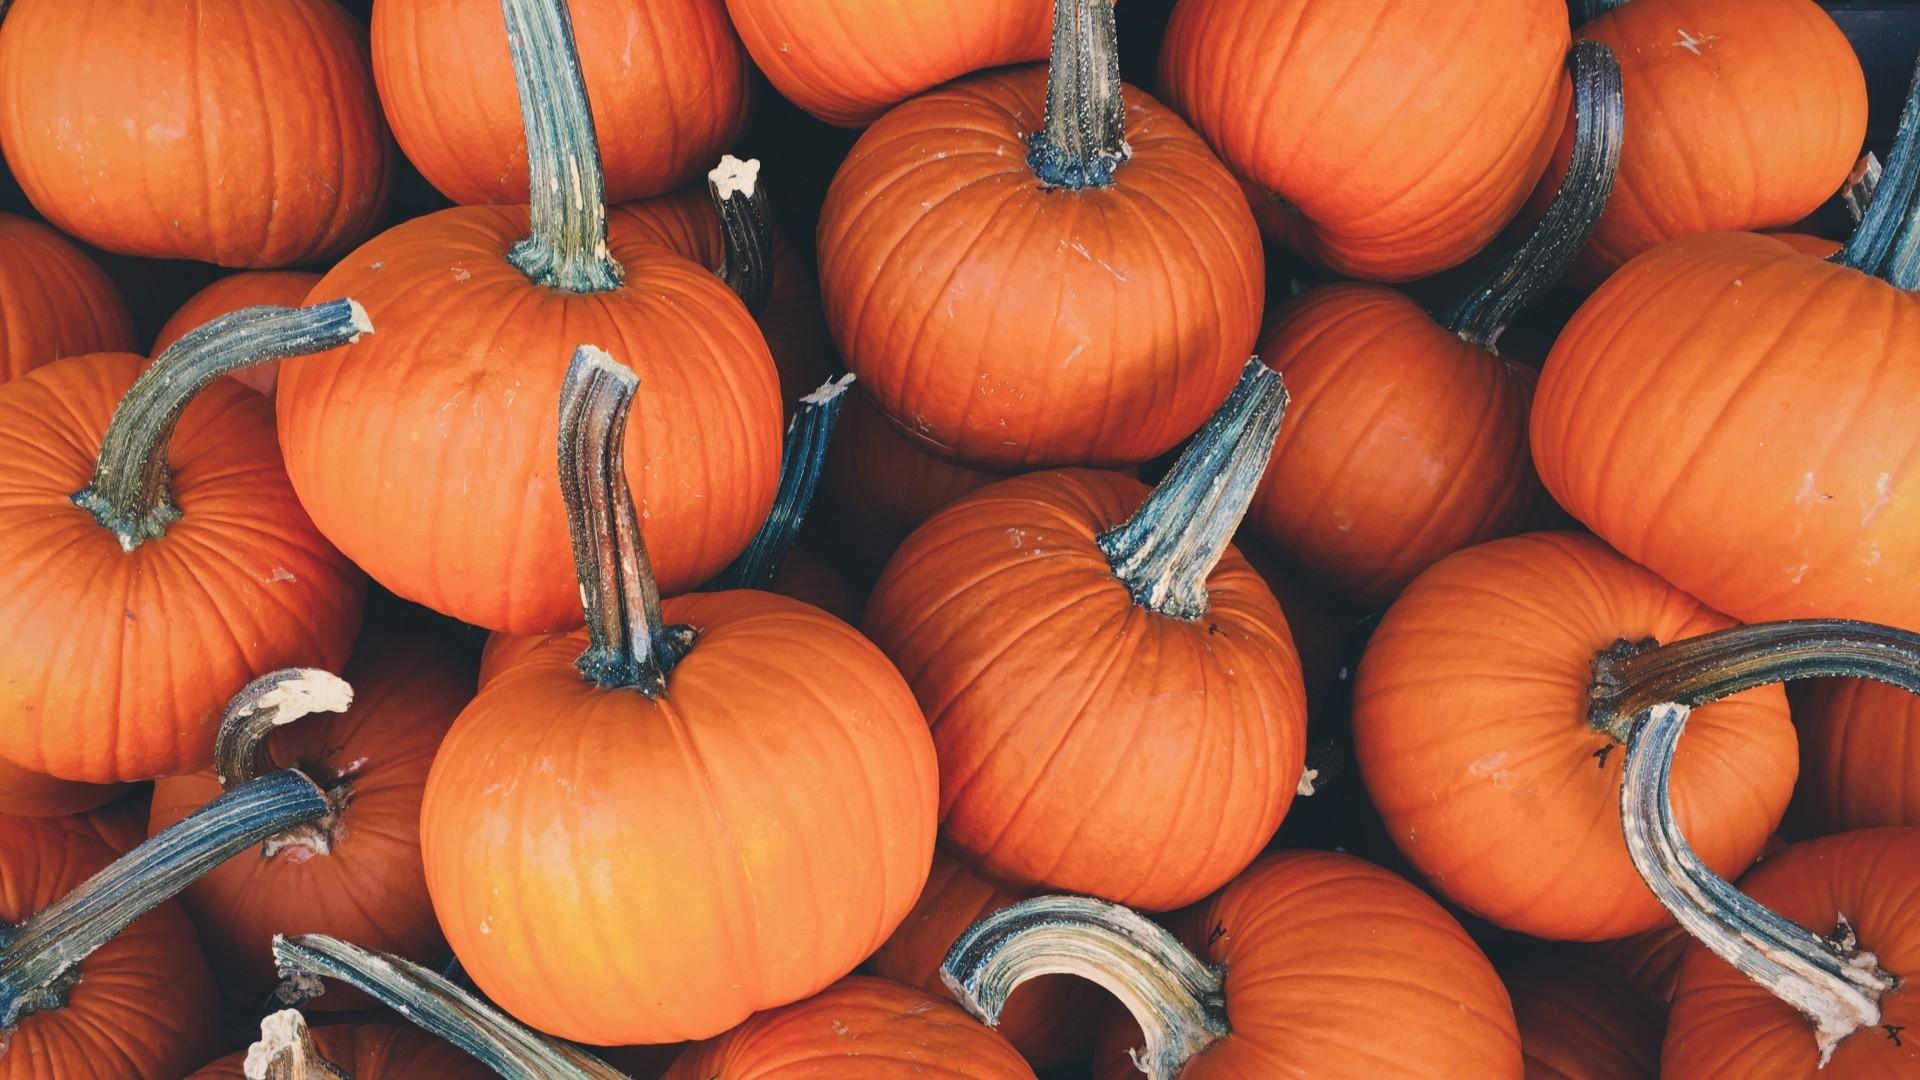 Pumpkin Wallpaper Picture hd